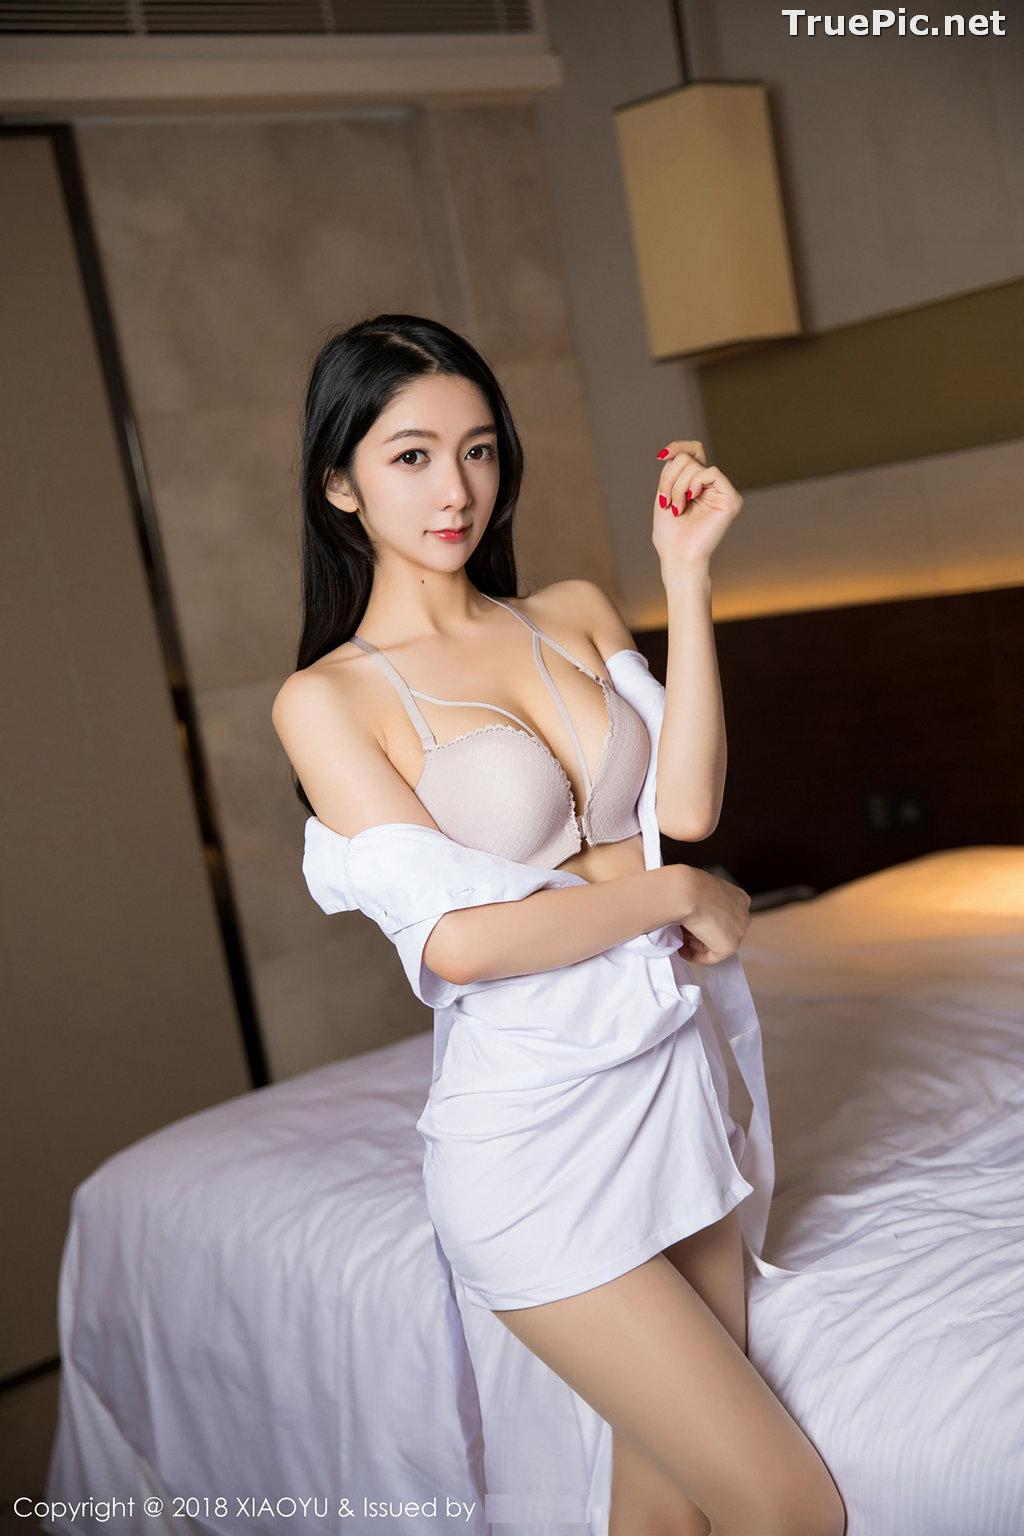 Image XiaoYu No.004 - Chinese Model - Xiao Reba (Angela喜欢猫) - White Sexy Nurse - TruePic.net - Picture-6